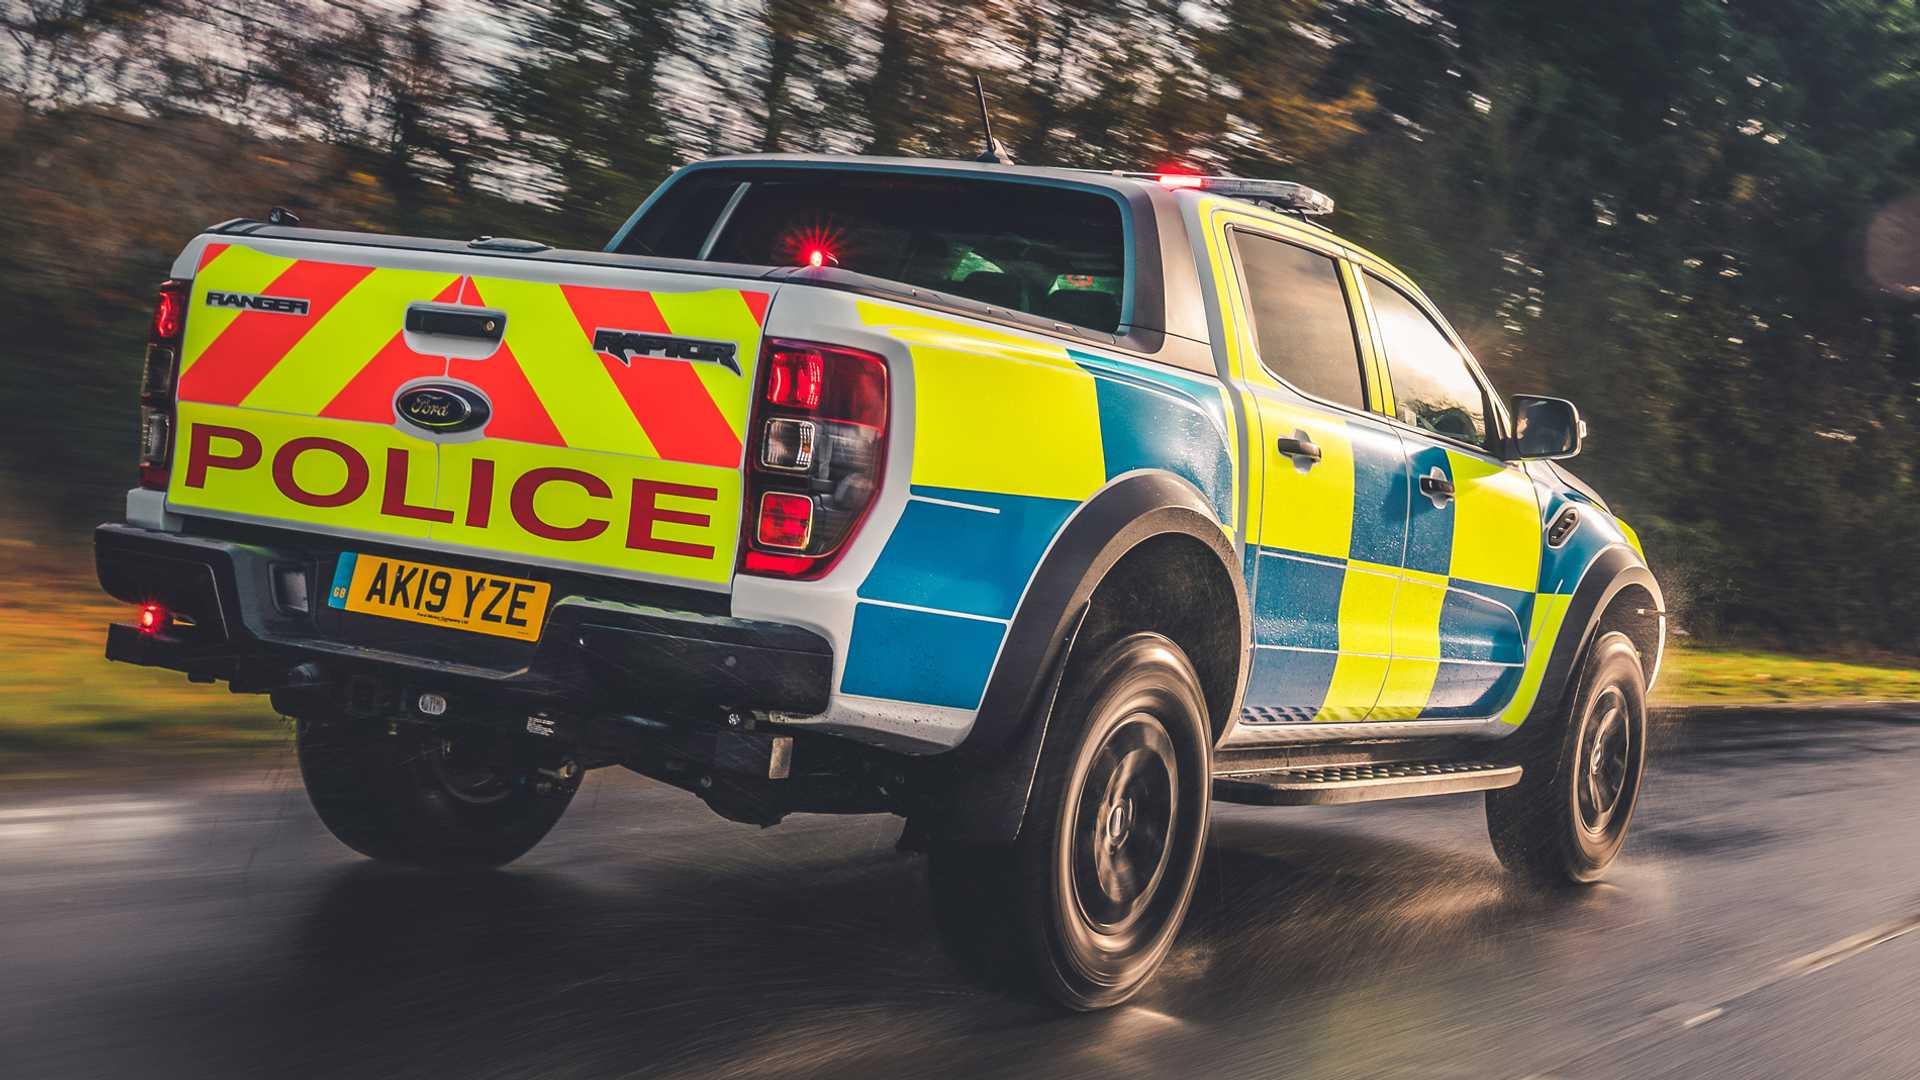 Ford-Focus-ST-and-Ranger-Raptor-UK-police-cars-13